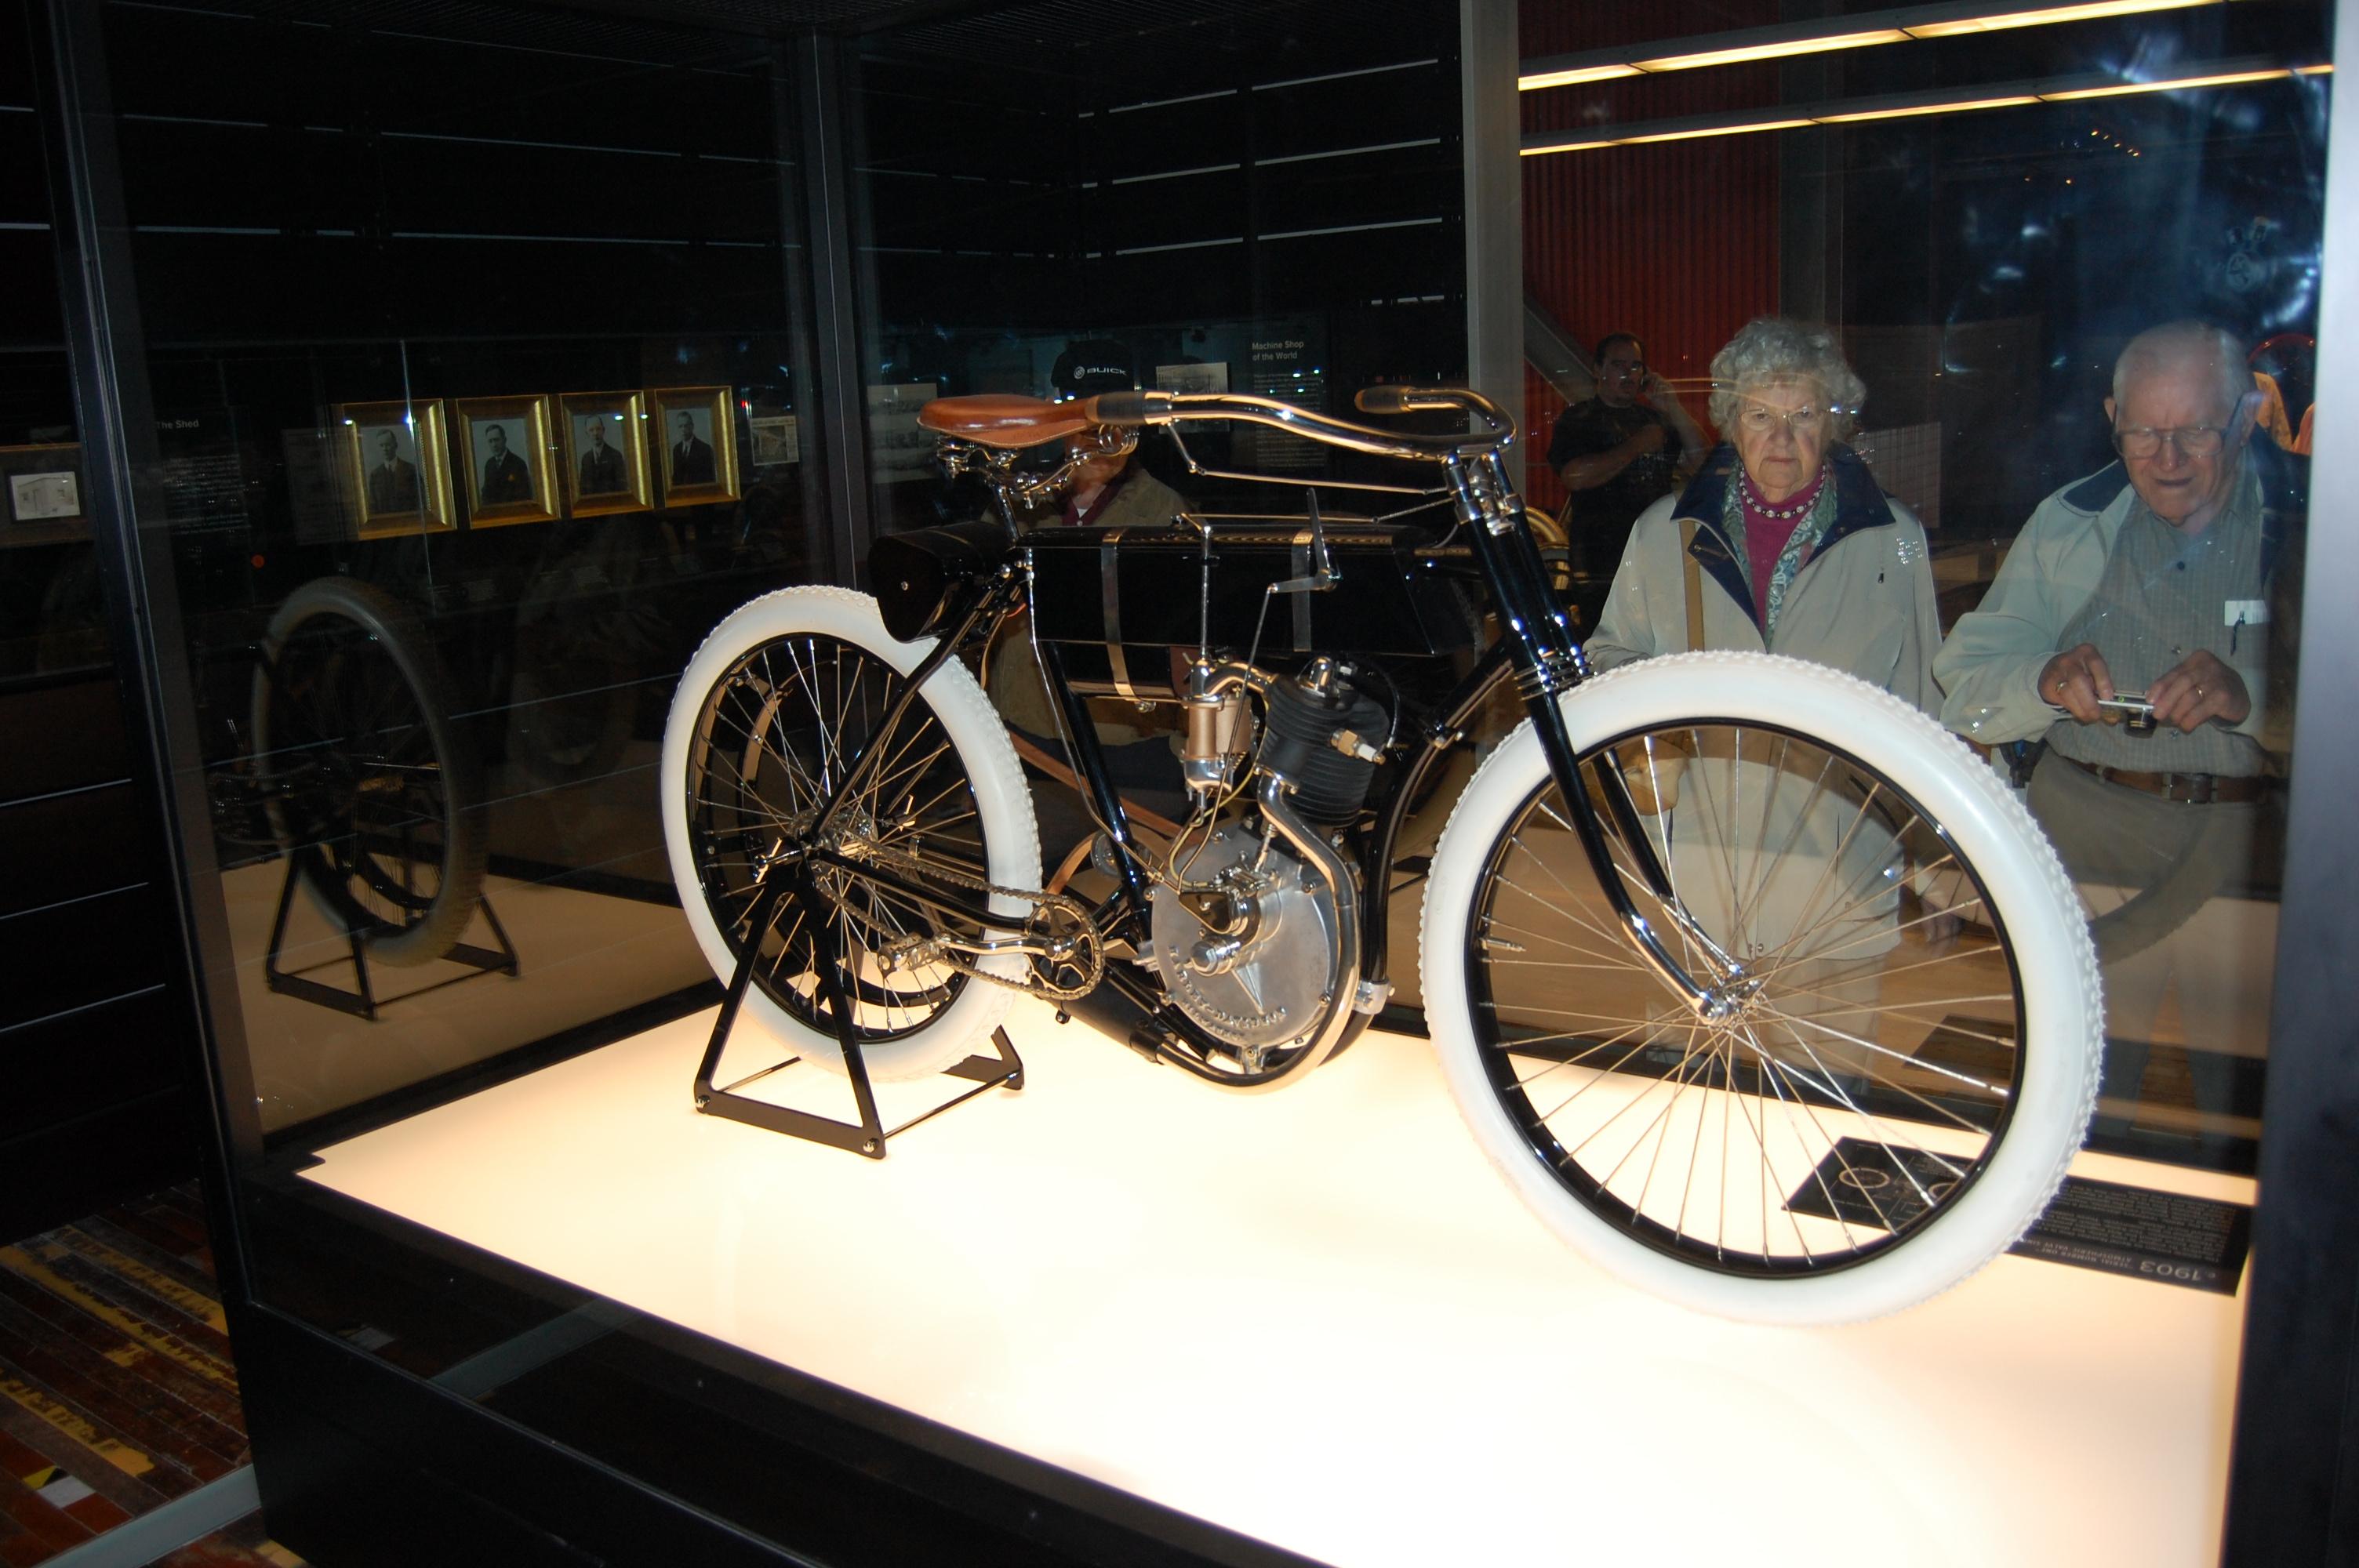 File:Harley-Davidson Museum Serial Number One.JPG - Wikimedia Commons